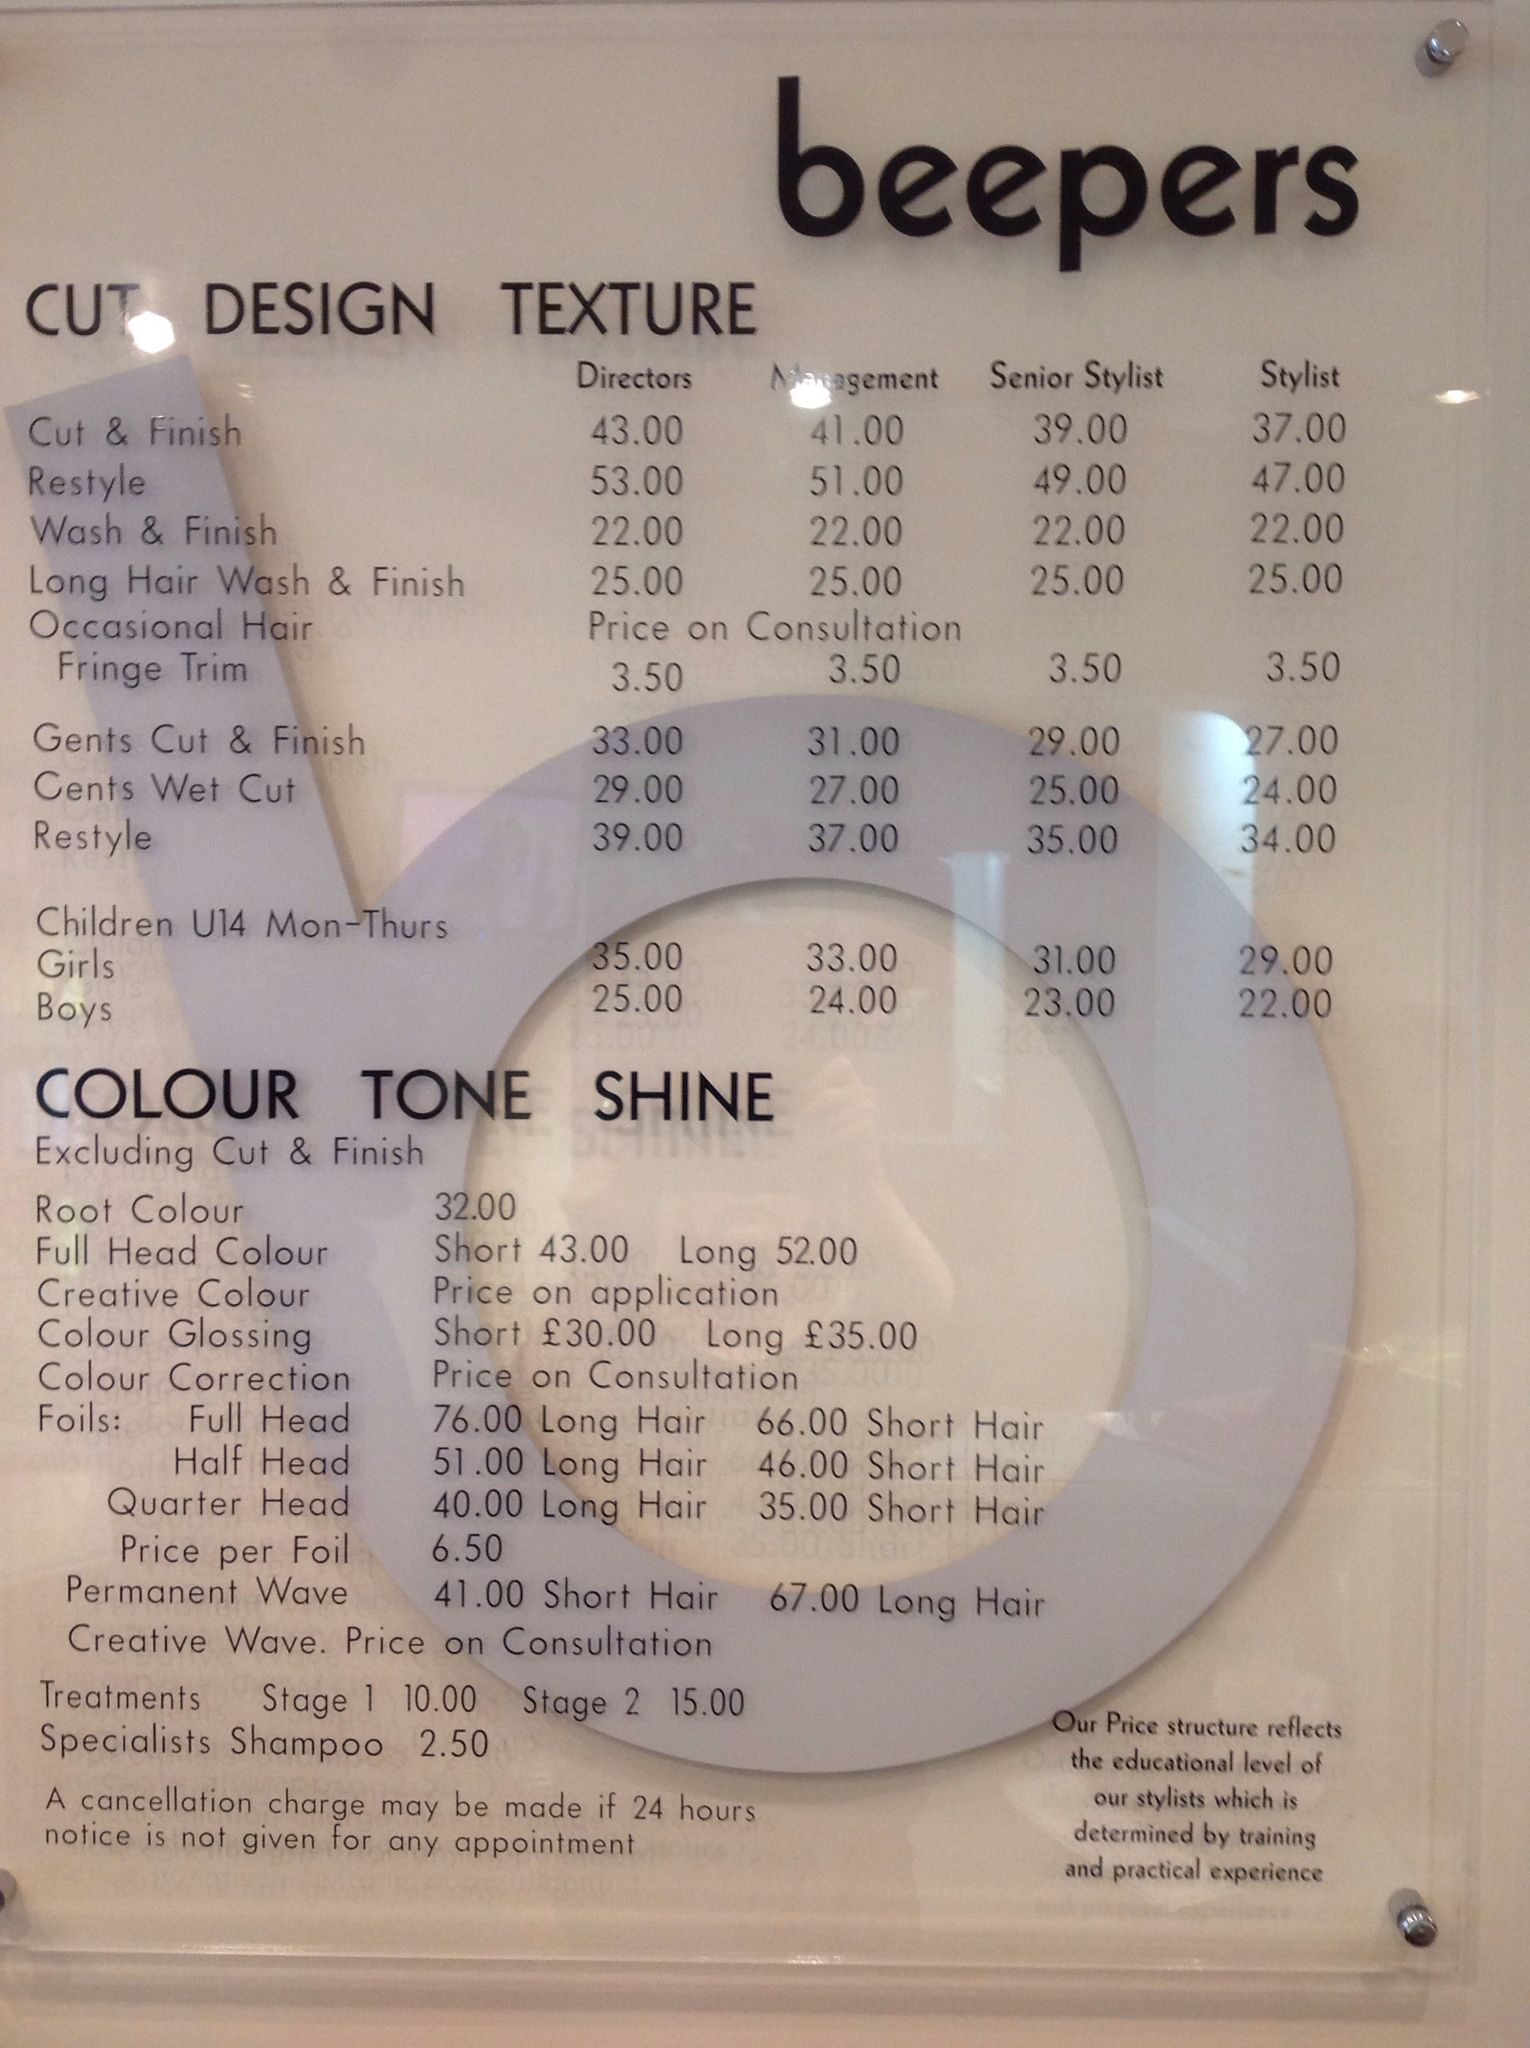 Beepers Hair Price List Hairdressing Salon Price List Washing Hair Hairdresser